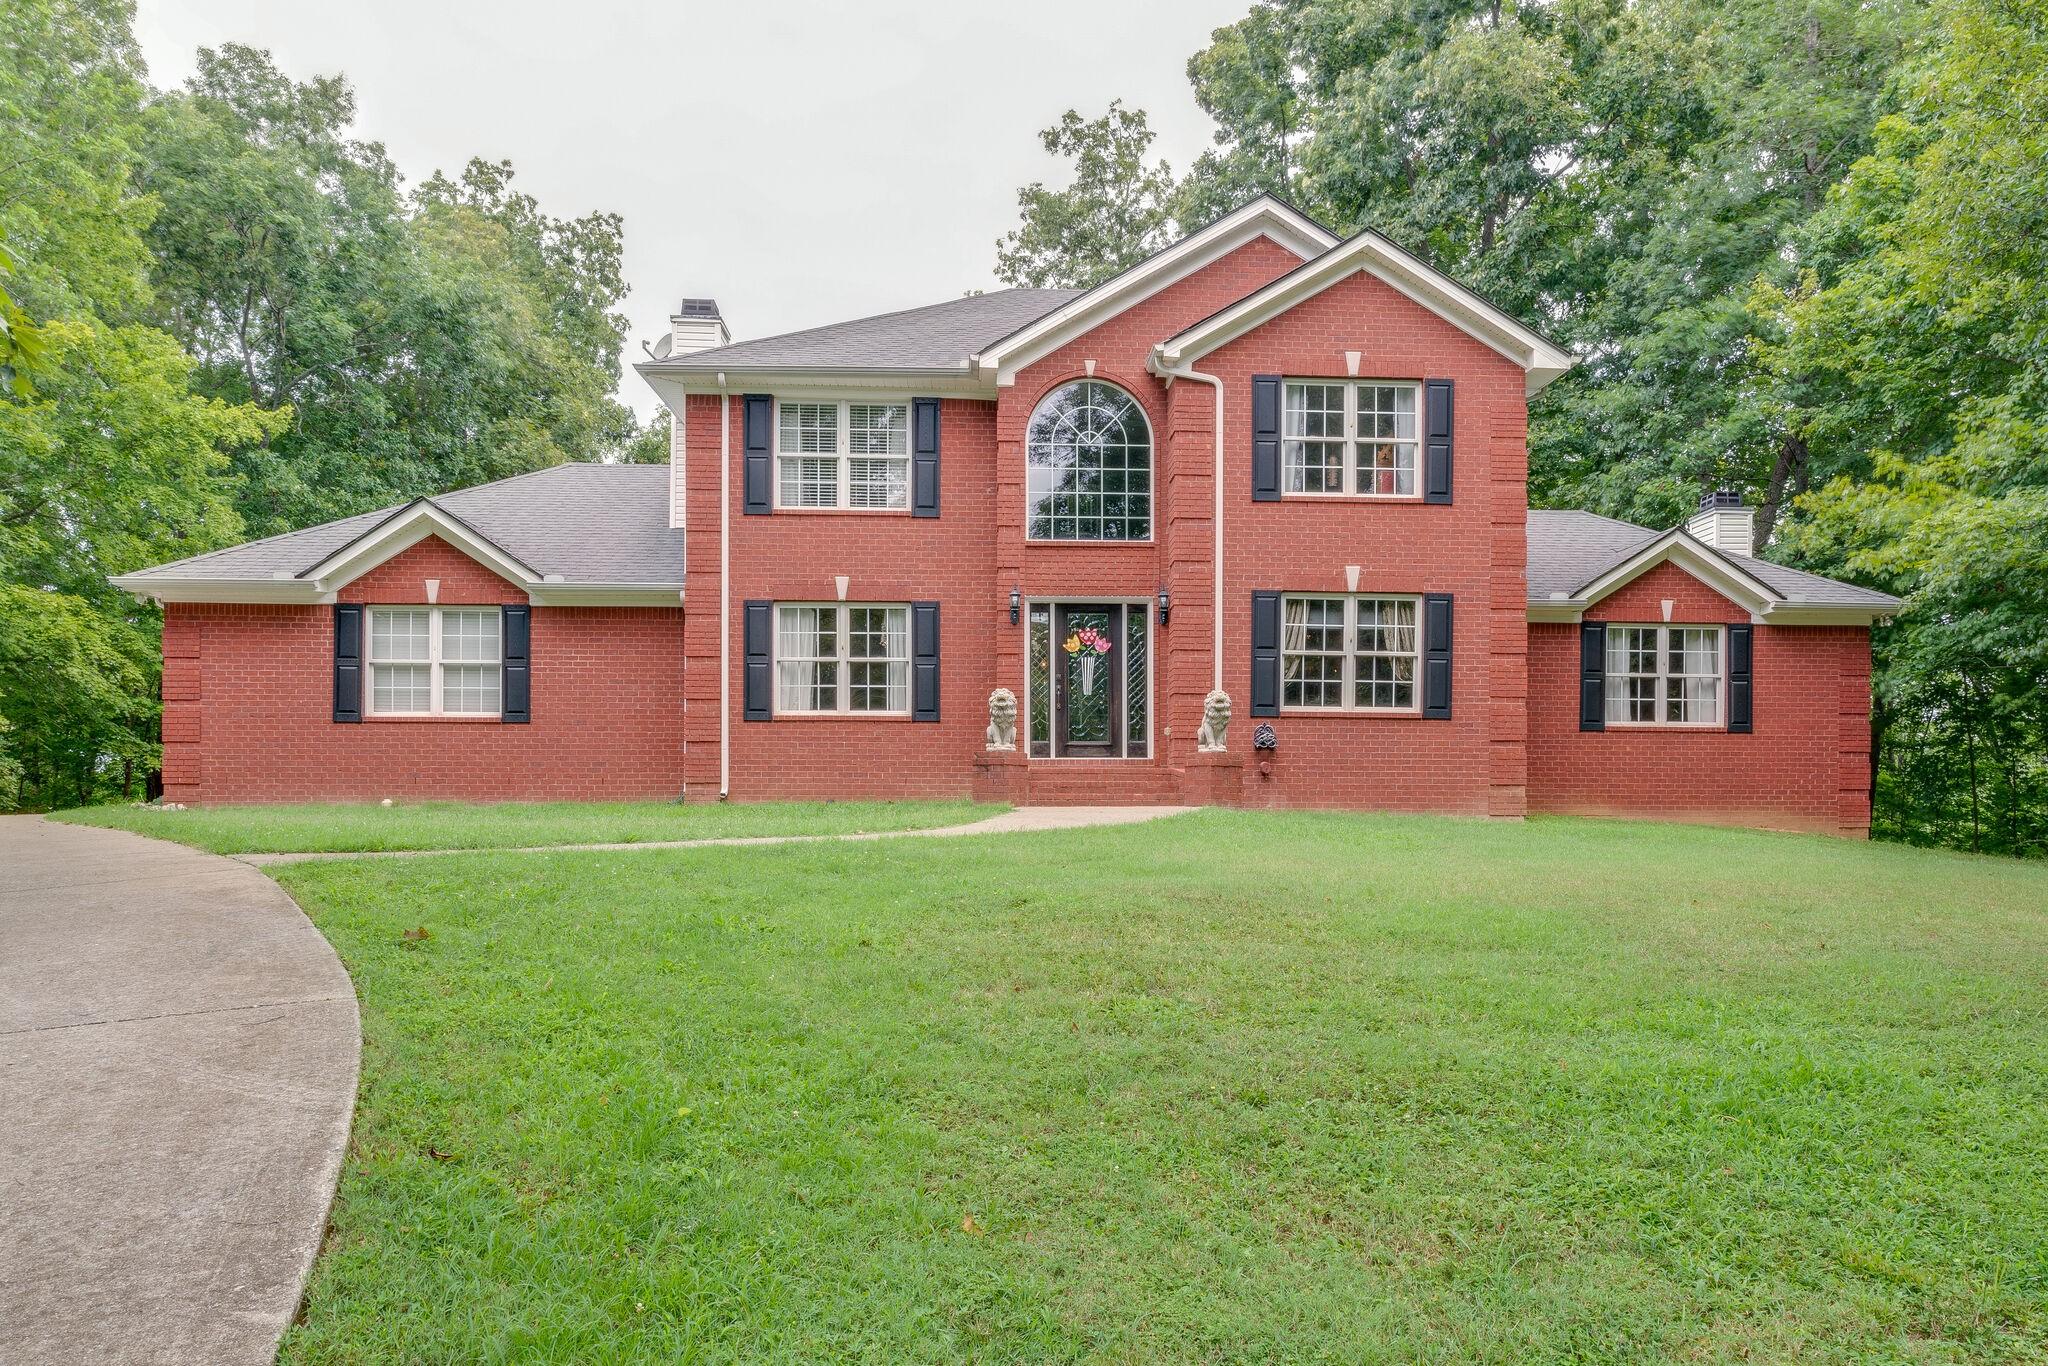 2239 Ingram Rd Property Photo - Whites Creek, TN real estate listing